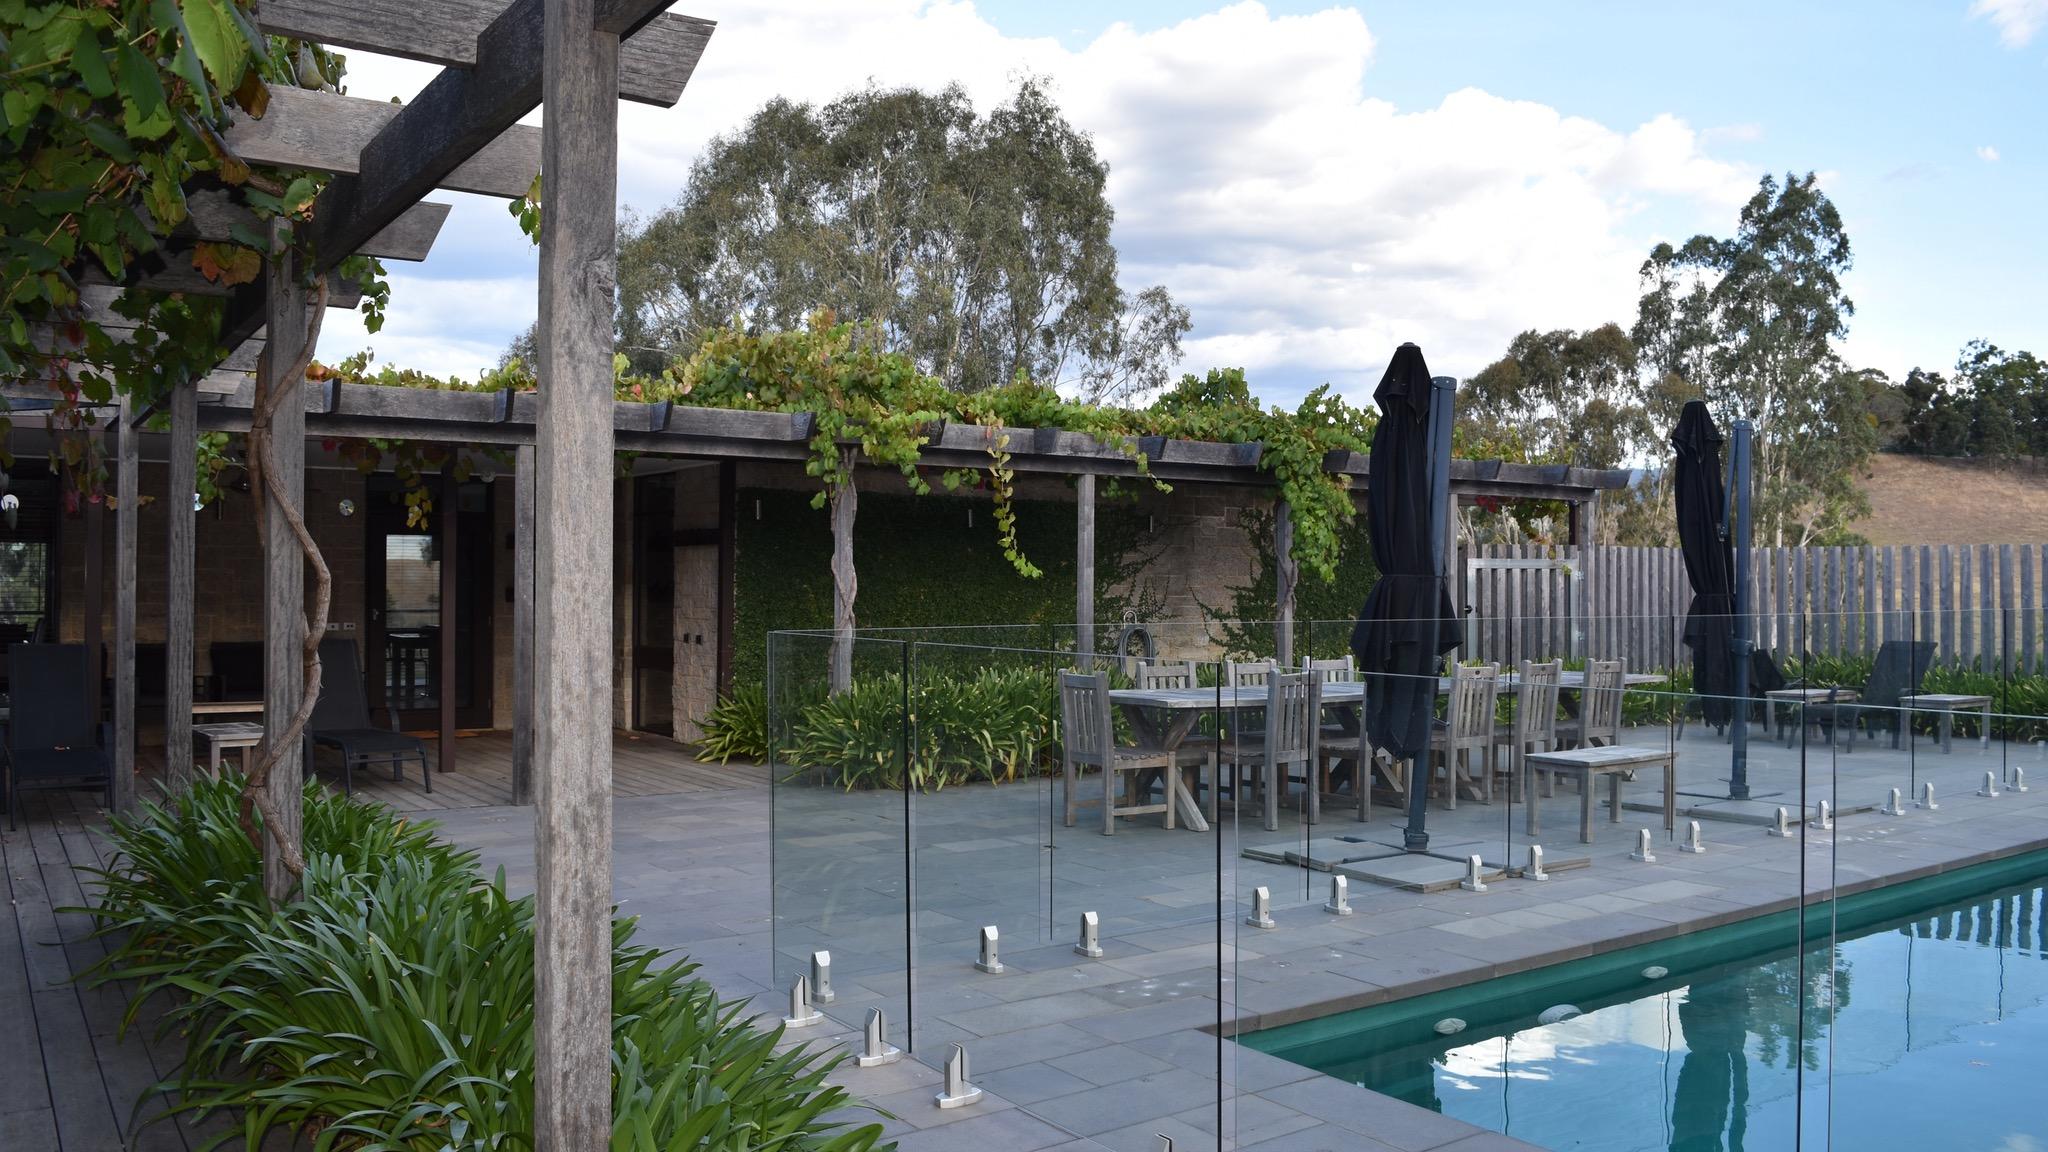 Umbrellas and shady pergolas with grapevines